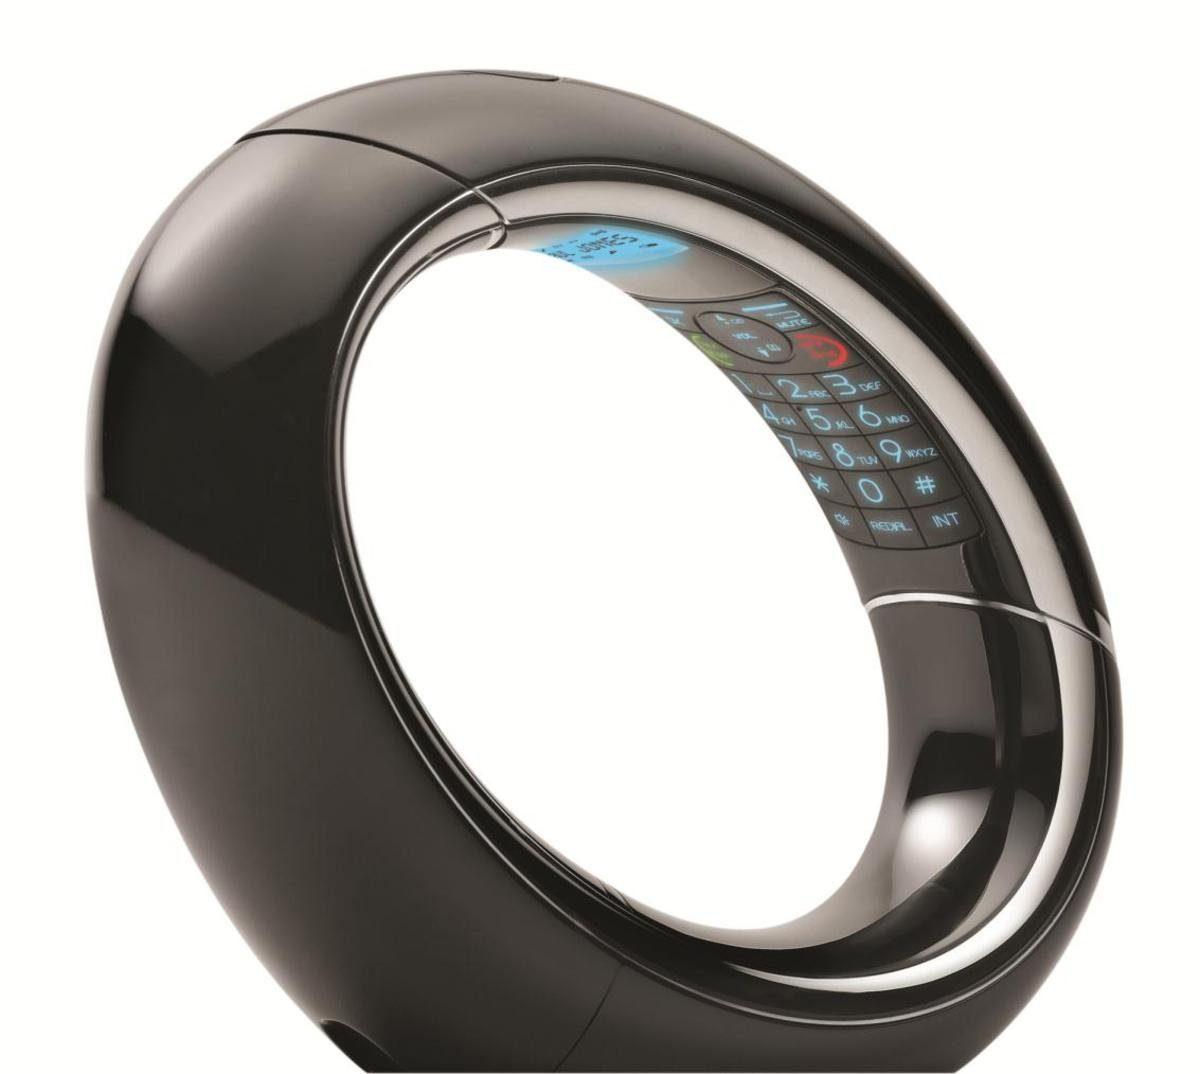 AEG Telefon analog schnurlos »Eclipse 15«